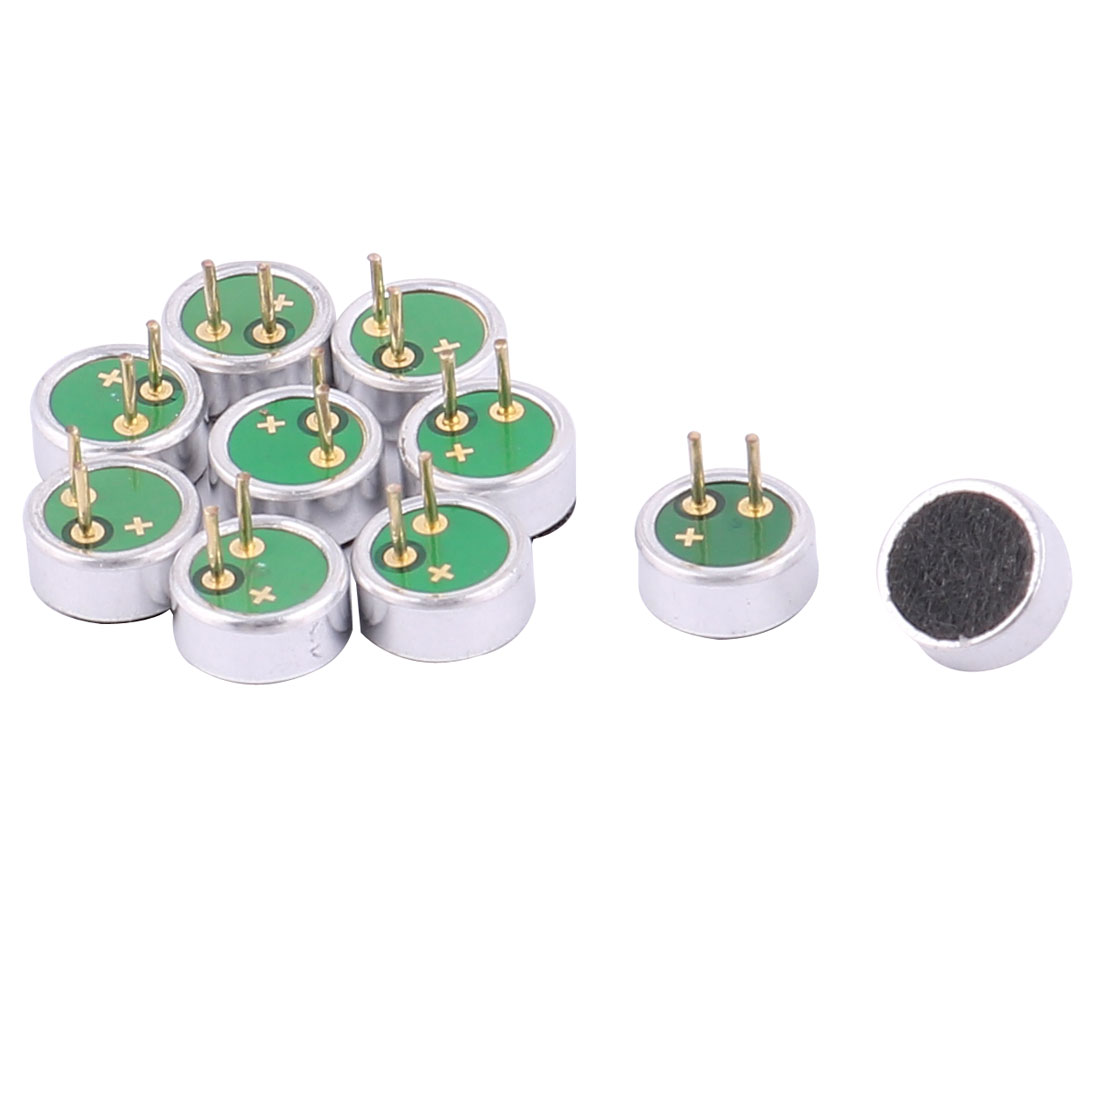 2 Terminal MIC Capsule Electret Condenser Microphone 6mm x 2.7mm 10 Pcs